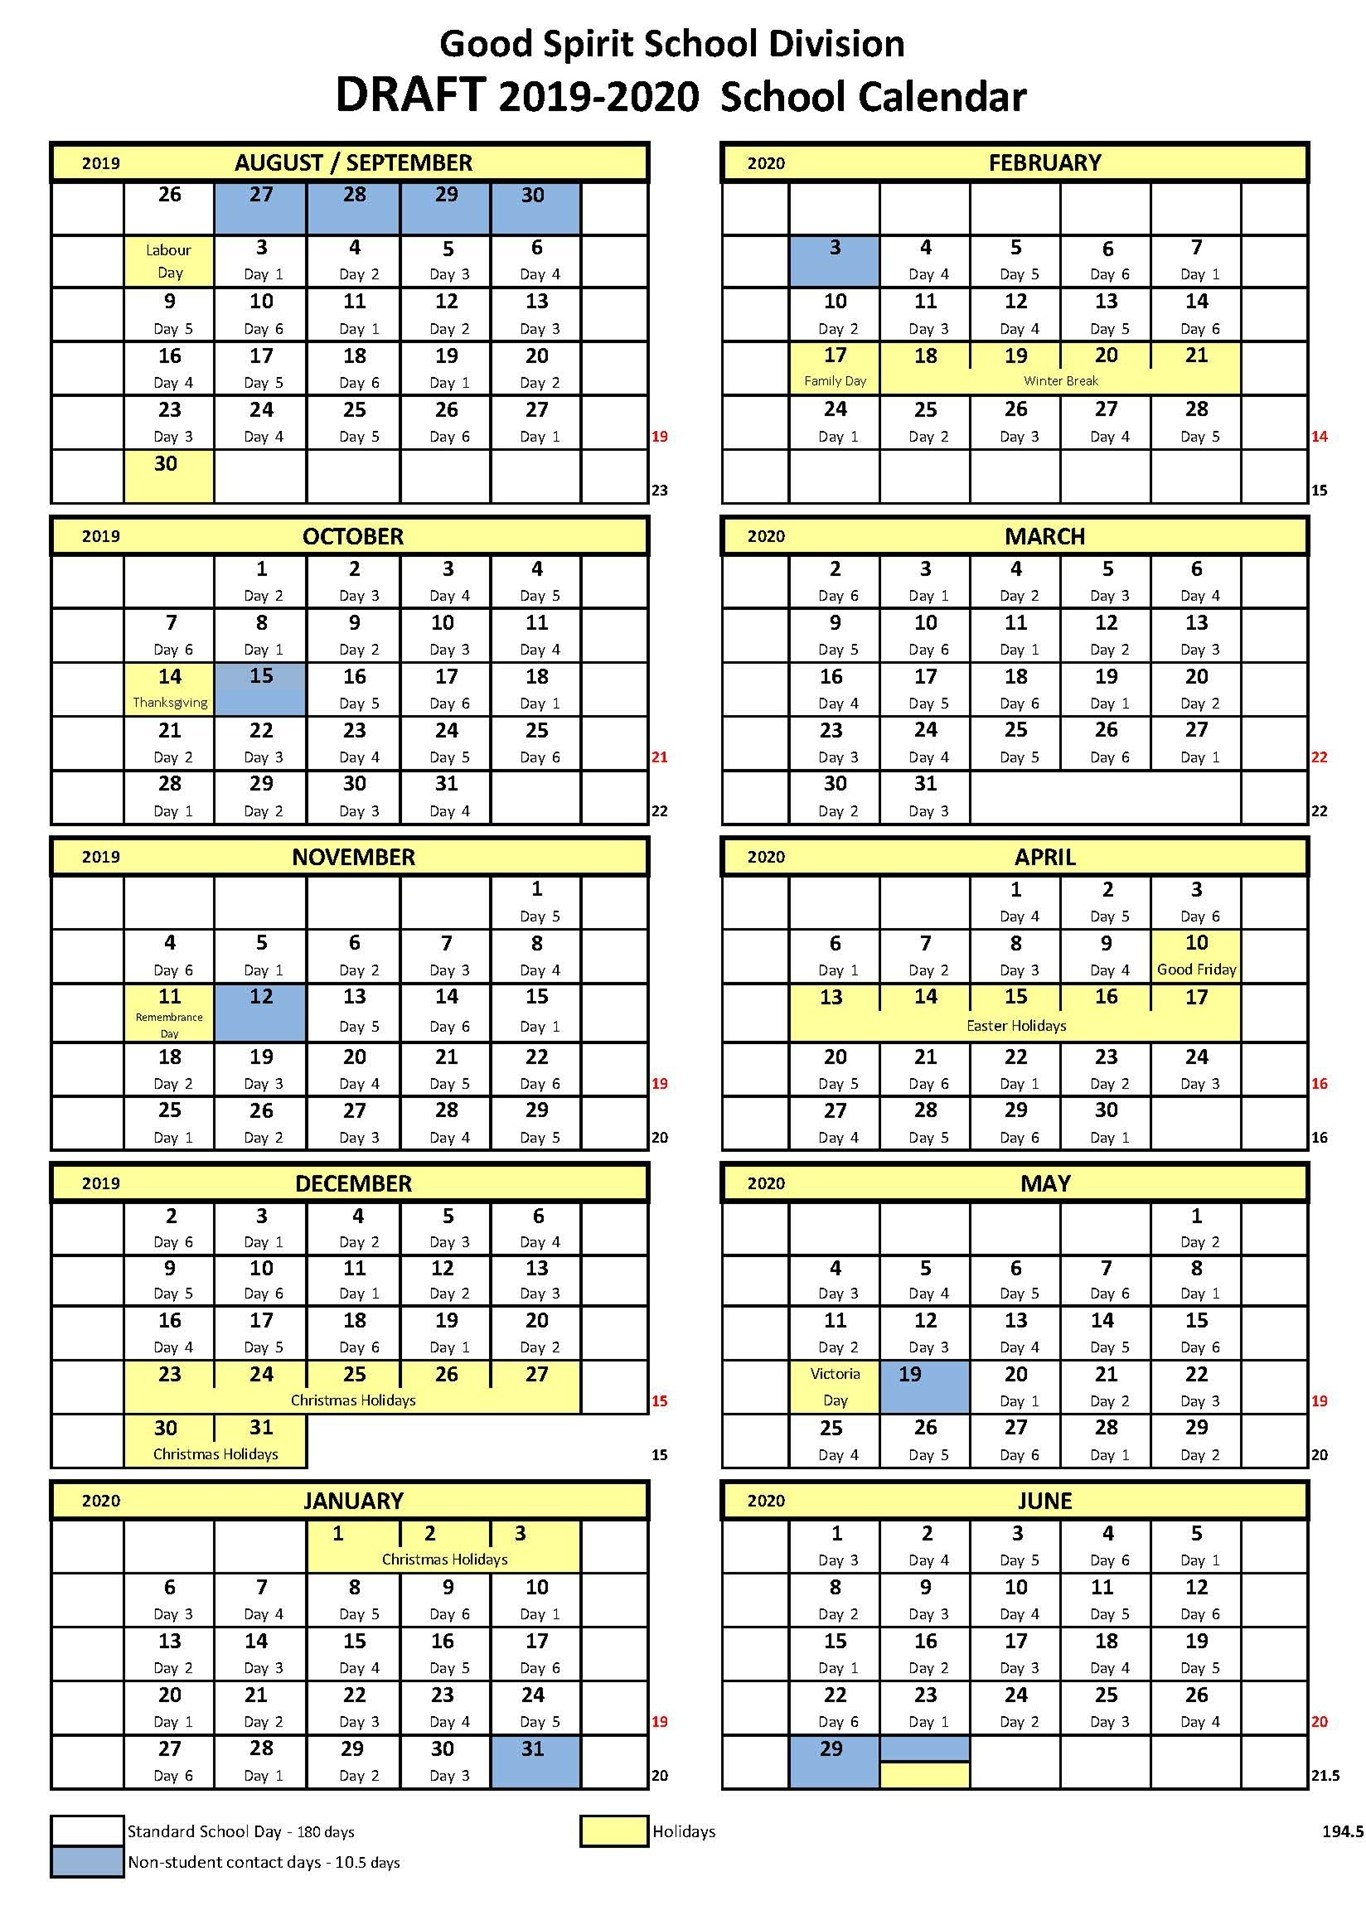 School Year Calendar – Good Spirit School Division 204 Ccsd Calendar 2019 20